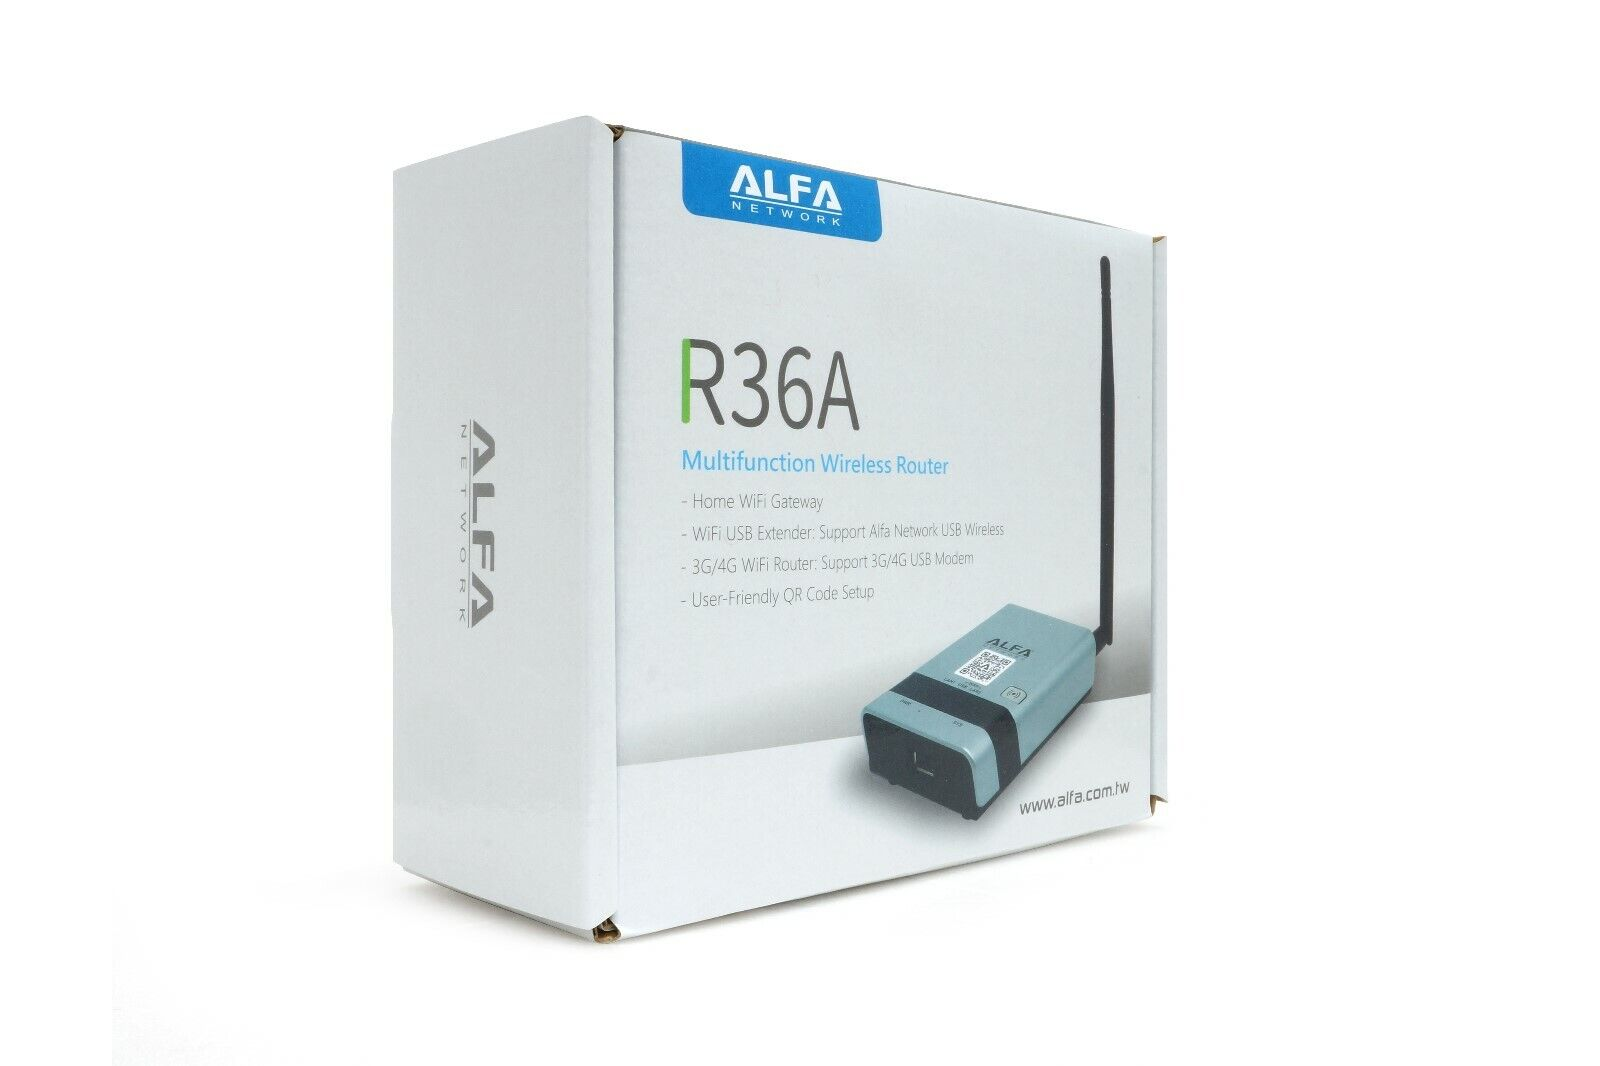 ALFR36NEW Alfa Wide-Coverage WiFi Broadband Router